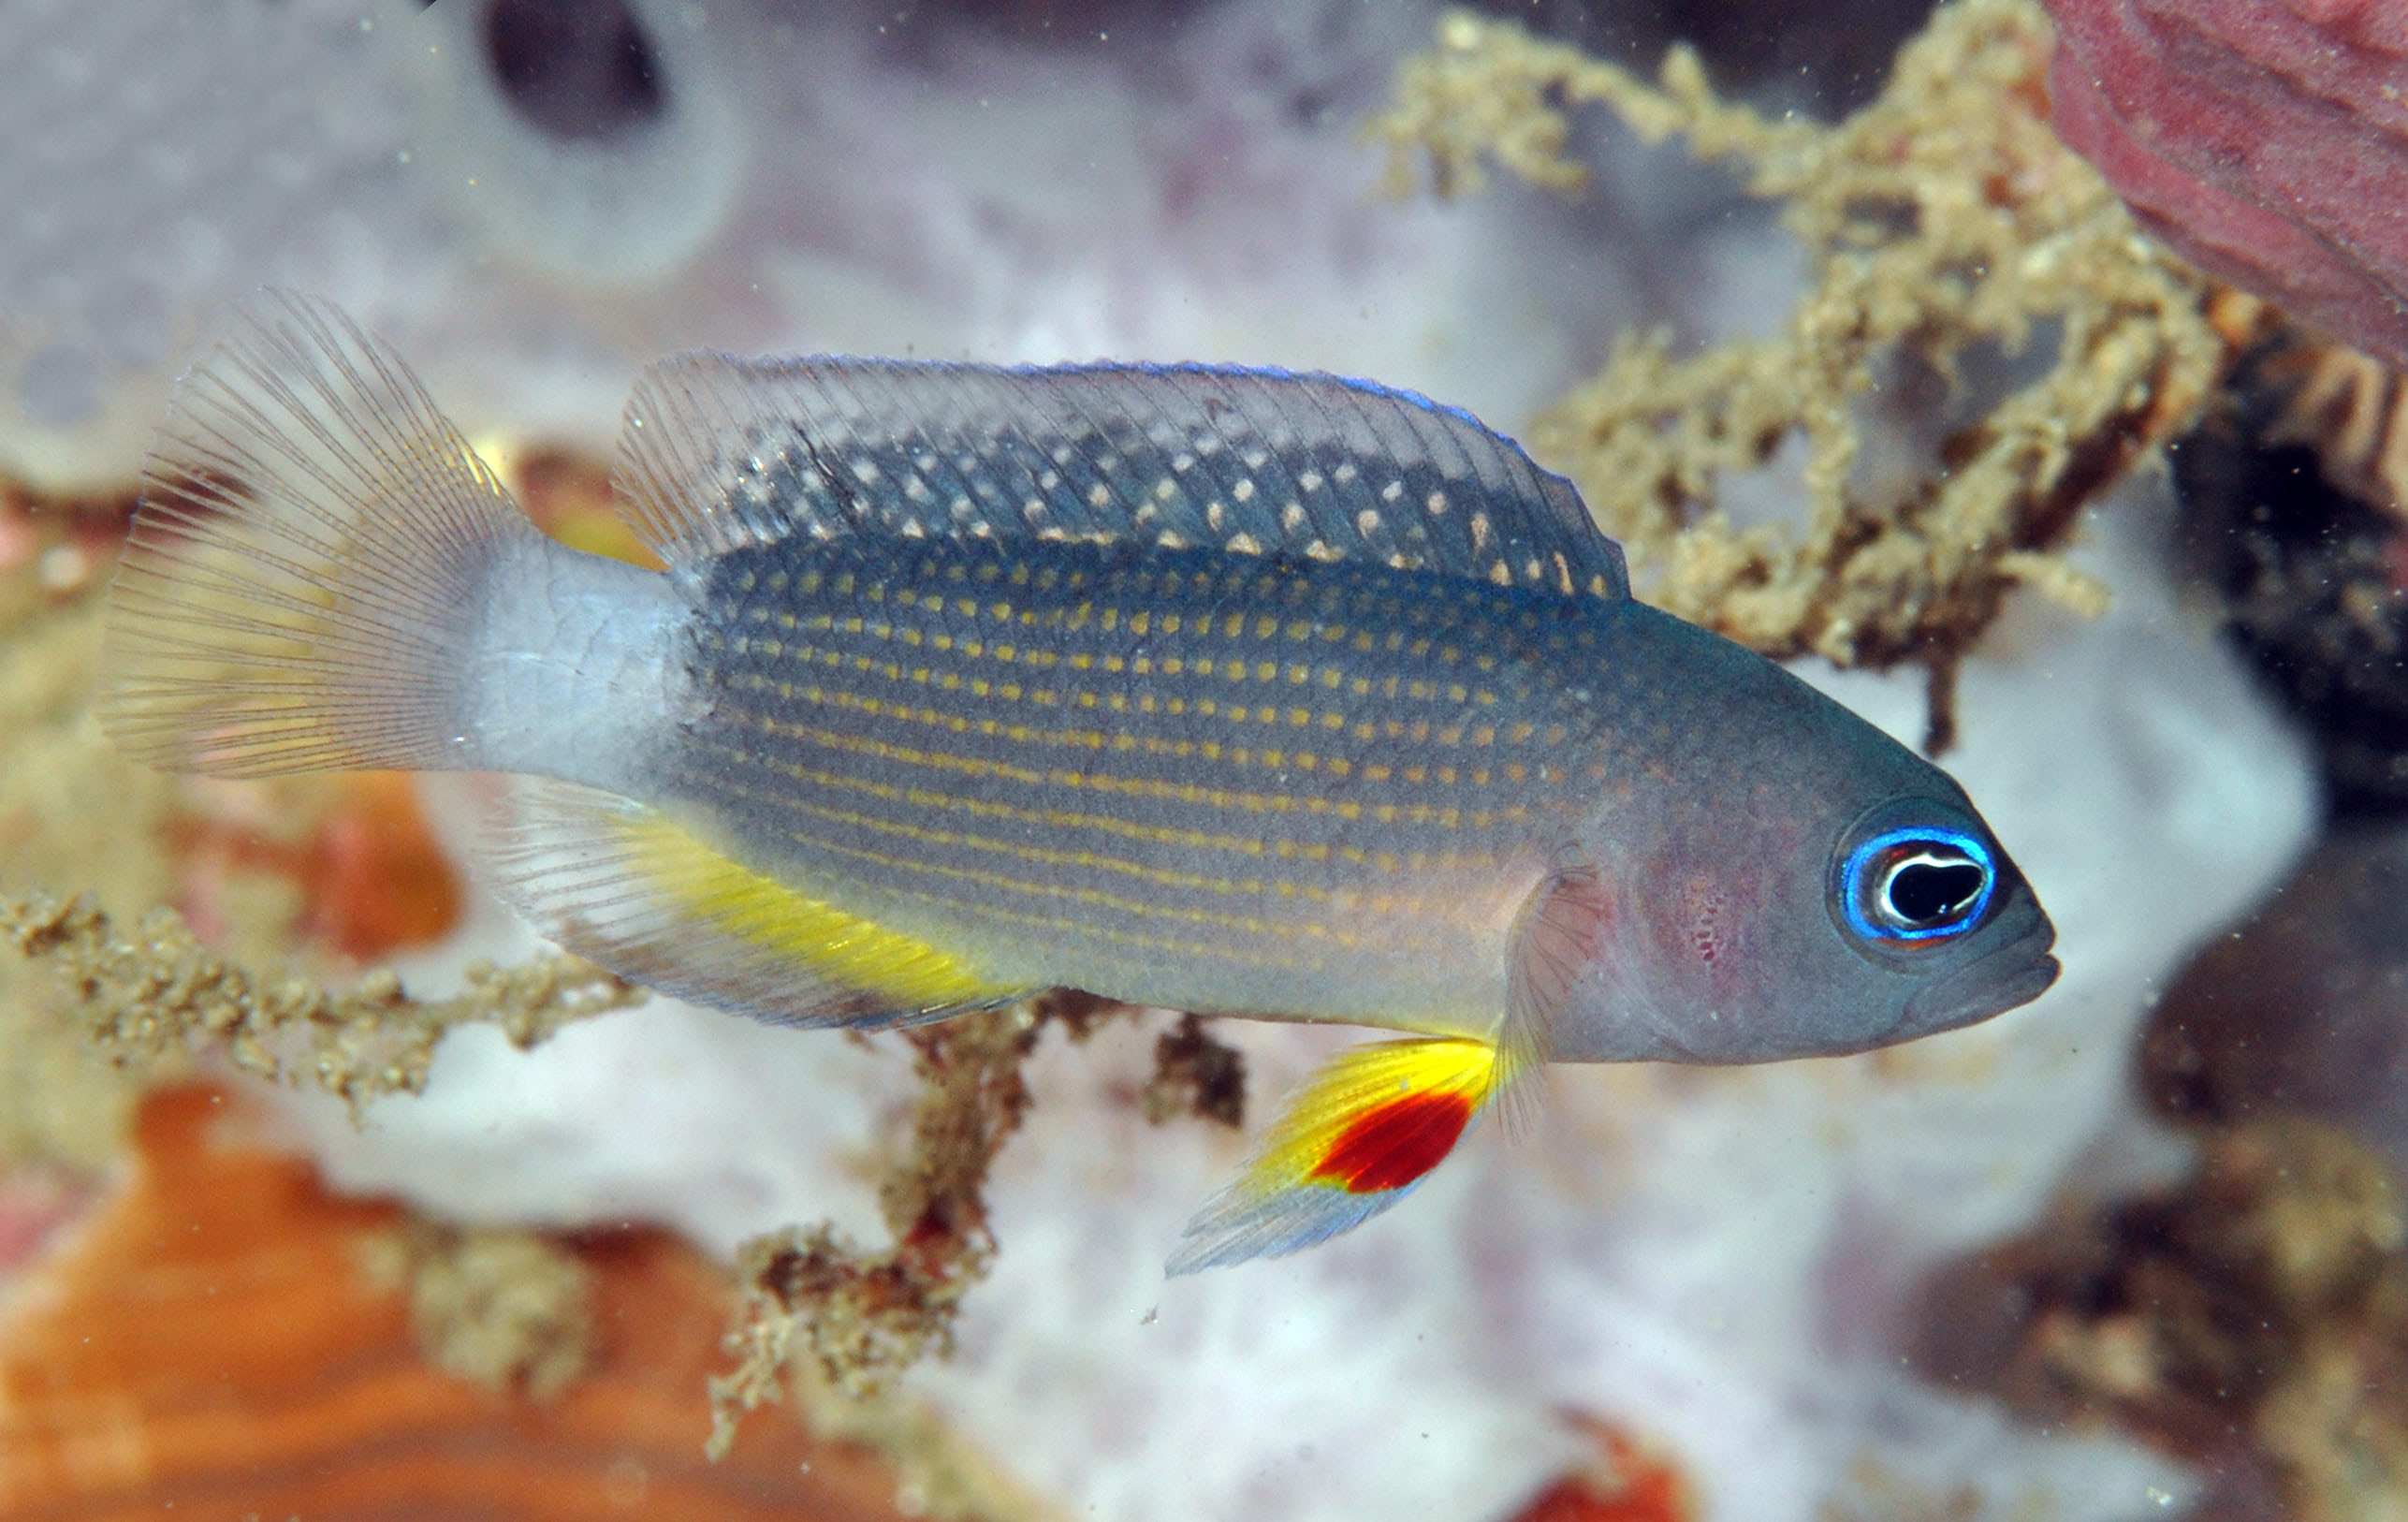 Acht Neue Fischarten Vor Bali Entdeckt BodeBlog Tauchen In  #A05E2B 2573 1626 Foto Di Mobili Per Cucina